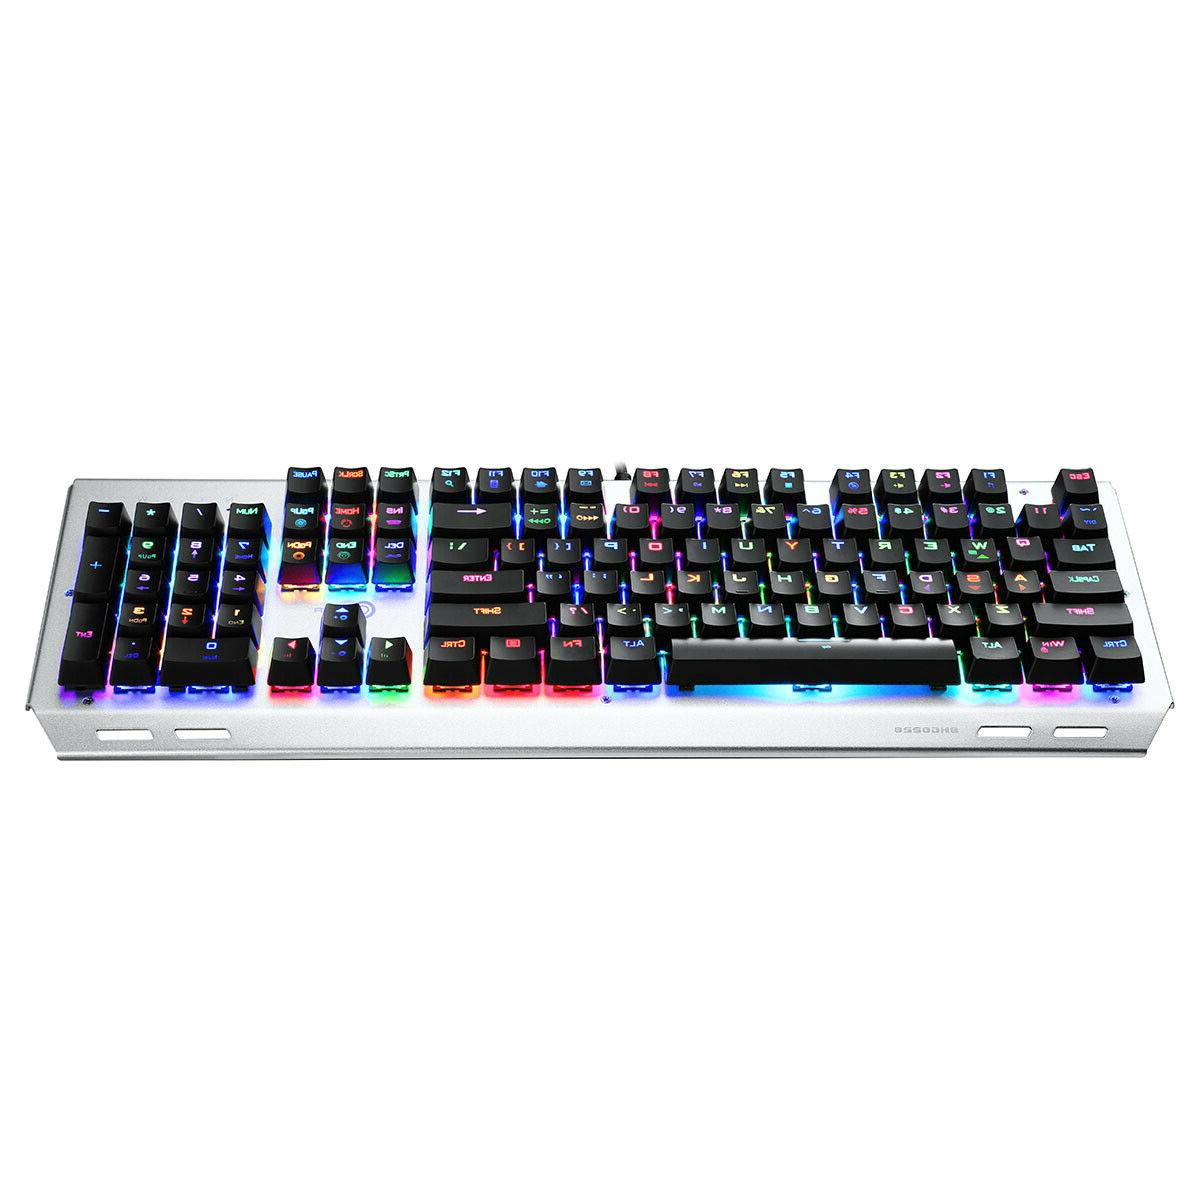 Mechanical Keyboard Wired Backlit Gaming Blue